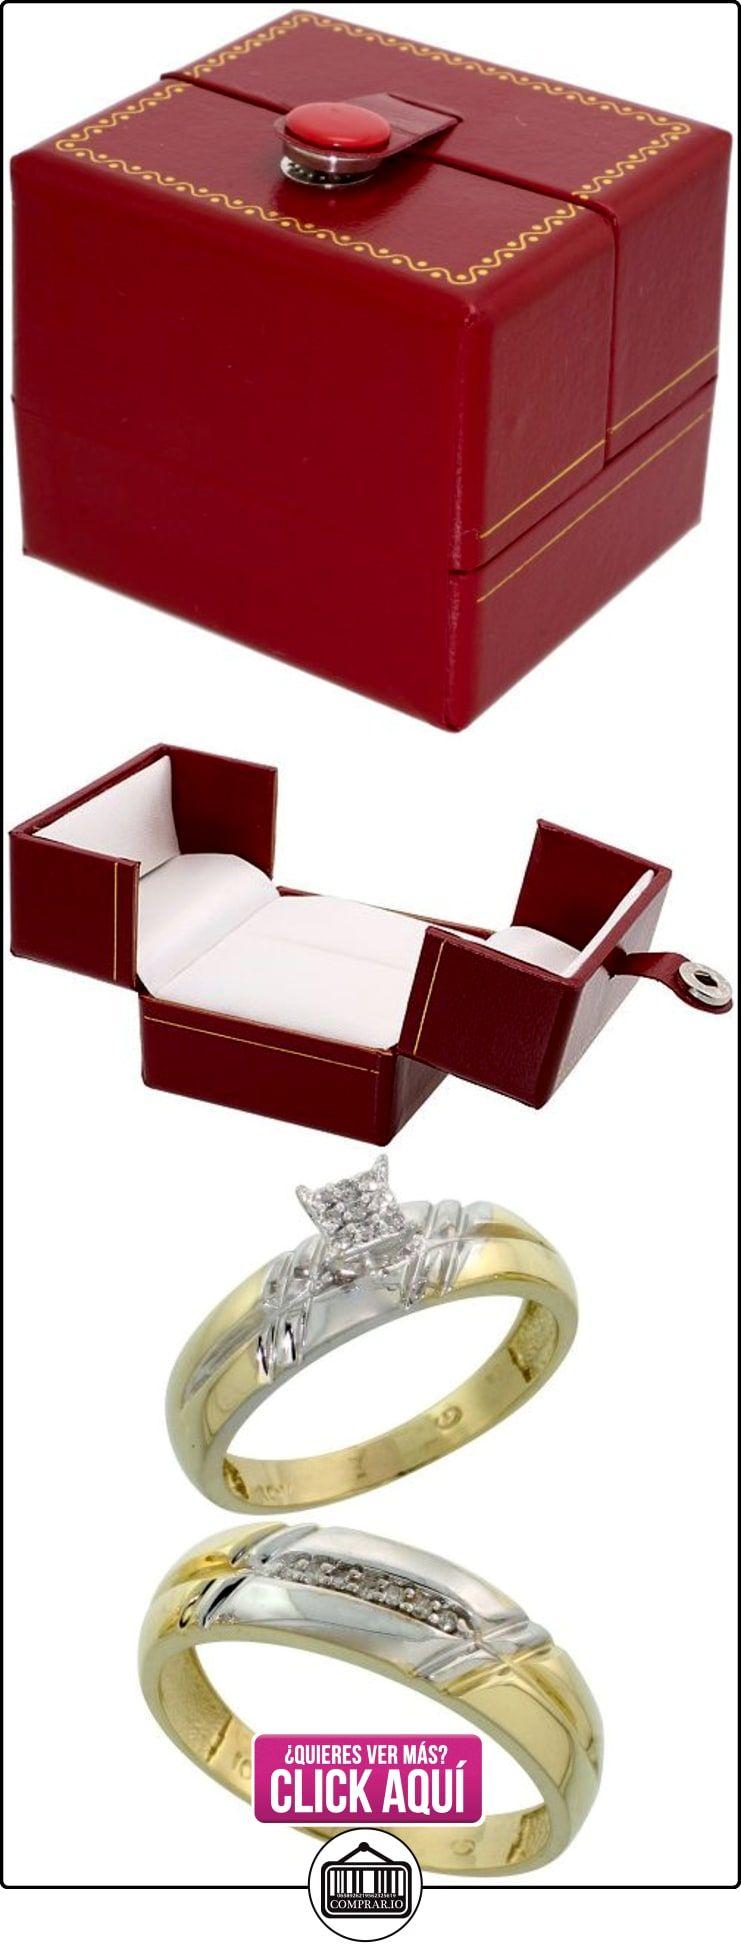 Revoni - Anillo de compromiso de oro amarillo  ✿ Joyas para hombres especiales - lujo ✿ ▬► Ver oferta: http://comprar.io/goto/B005M3H6XY